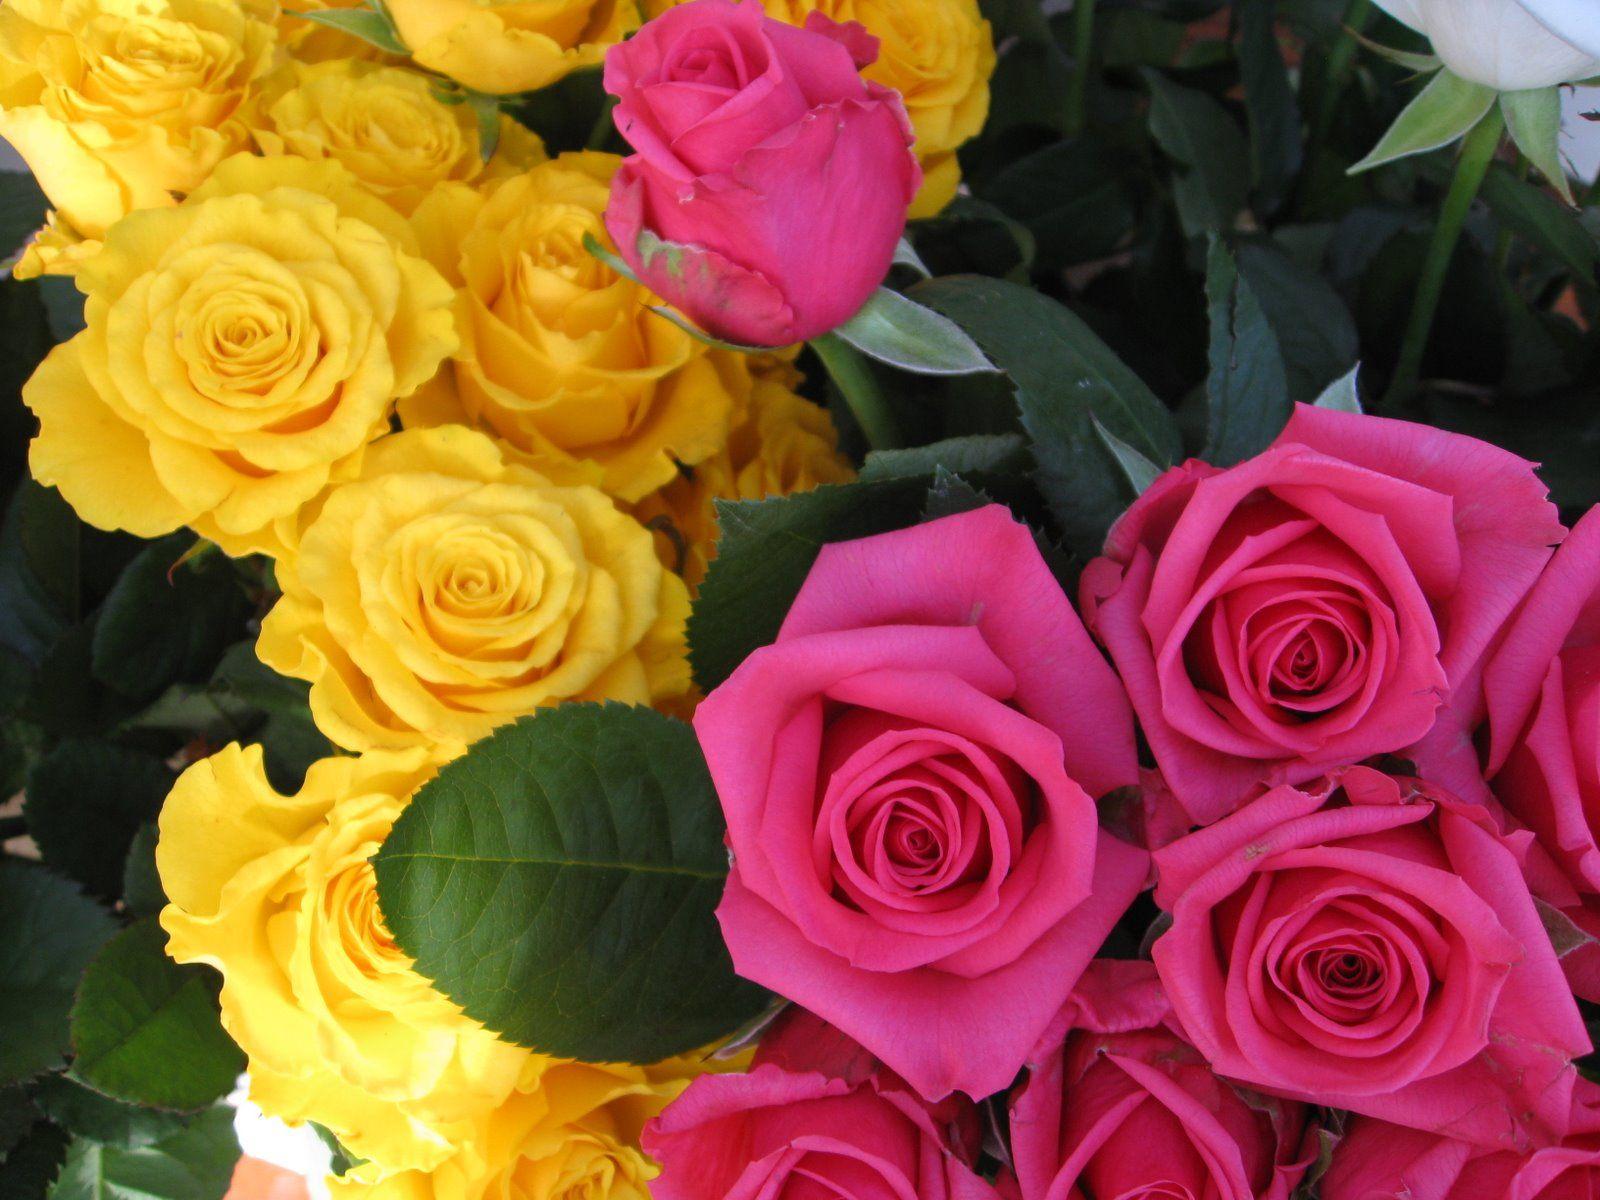 fotos de flores preciosas para fondo celular en hd hd wallpapers